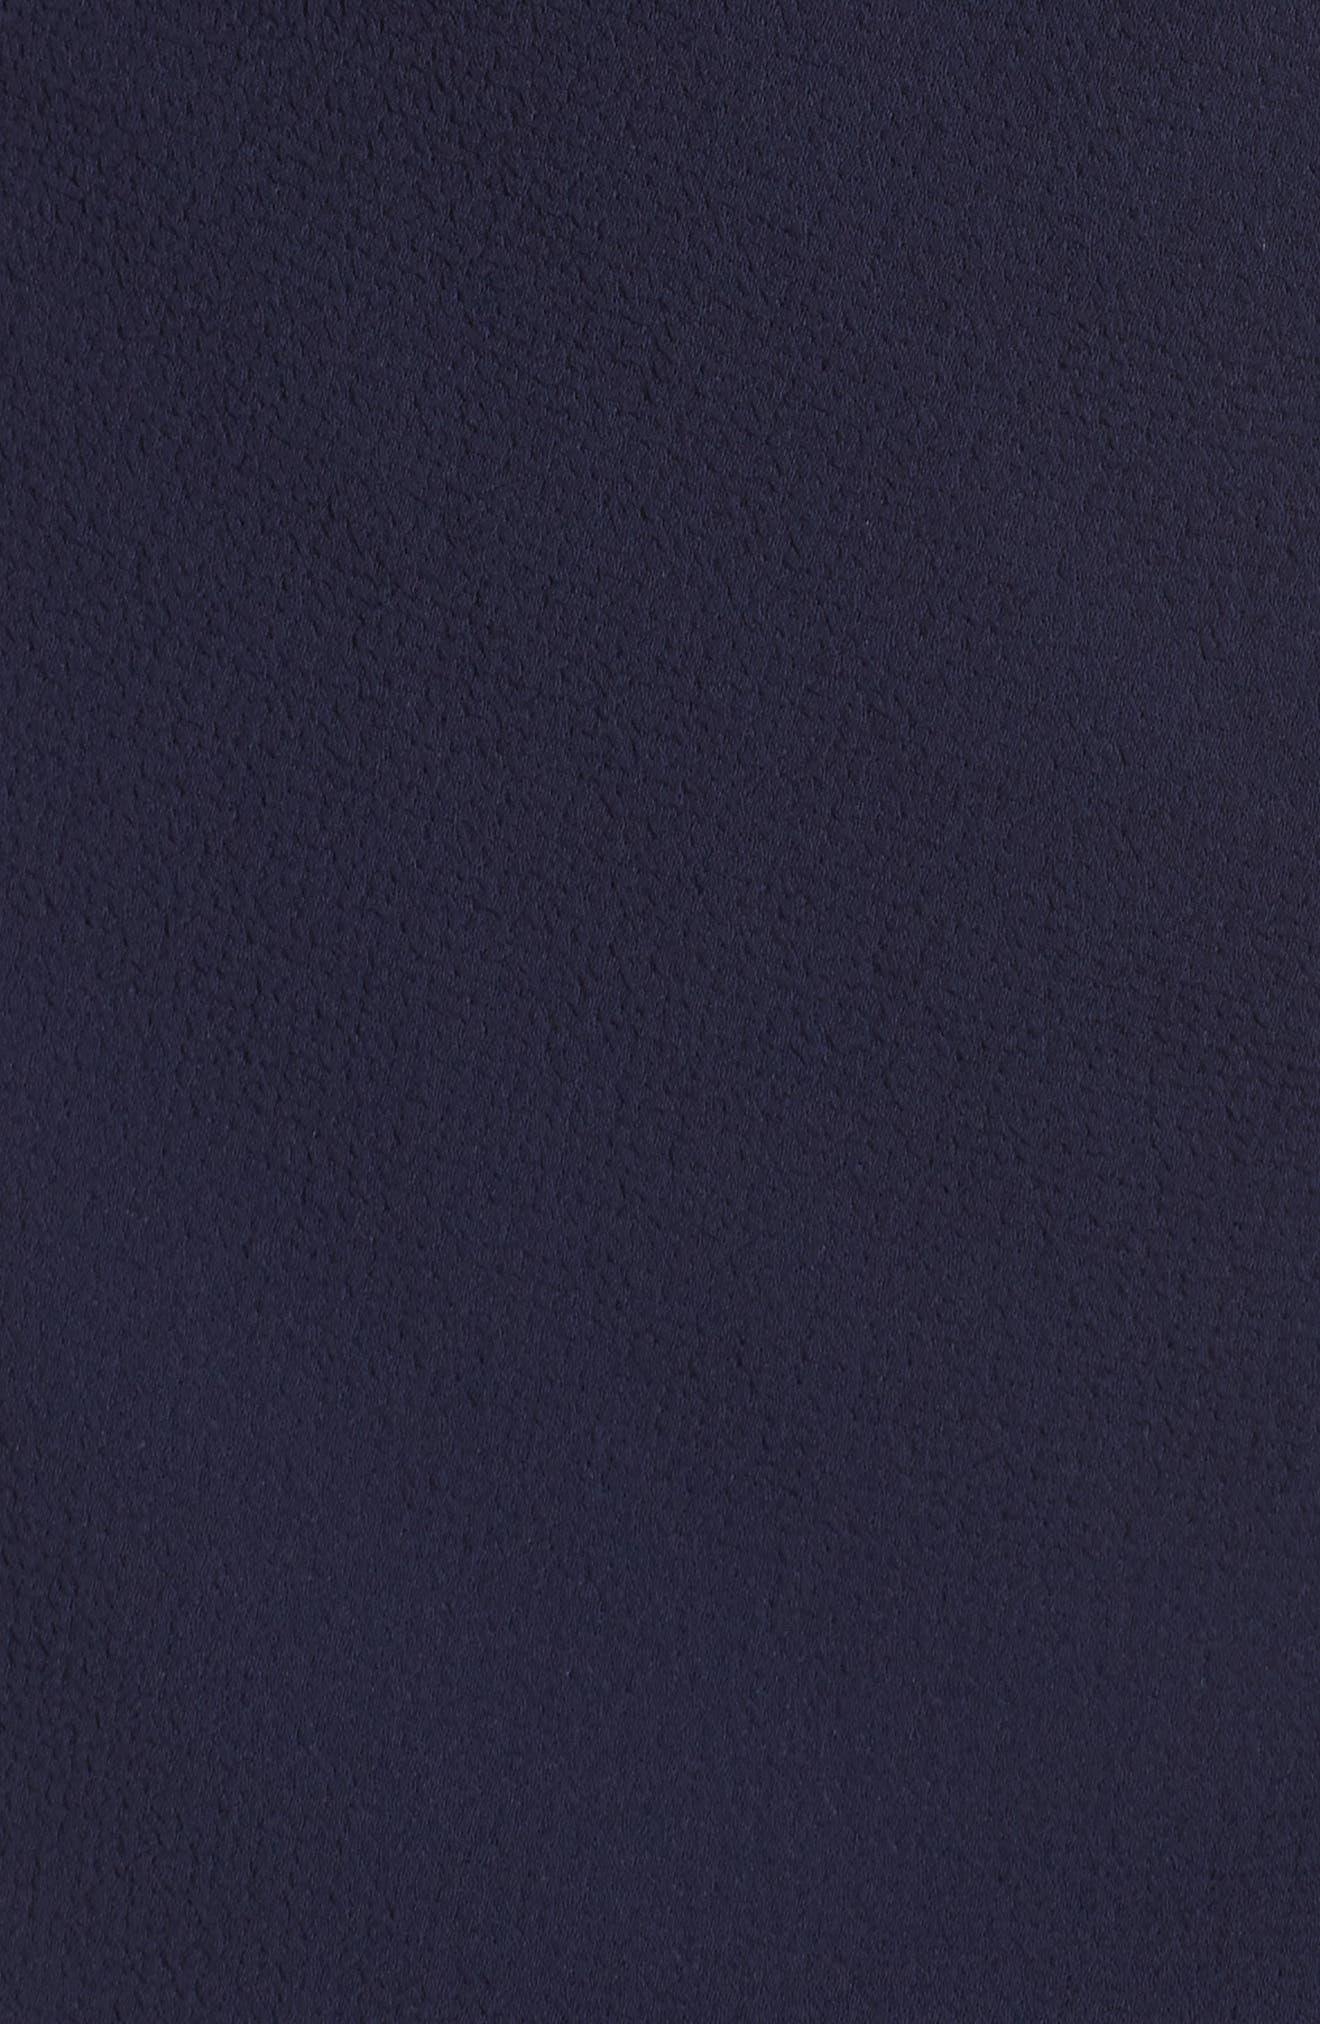 Pebble Crepe Off the Shoulder Gown,                             Alternate thumbnail 5, color,